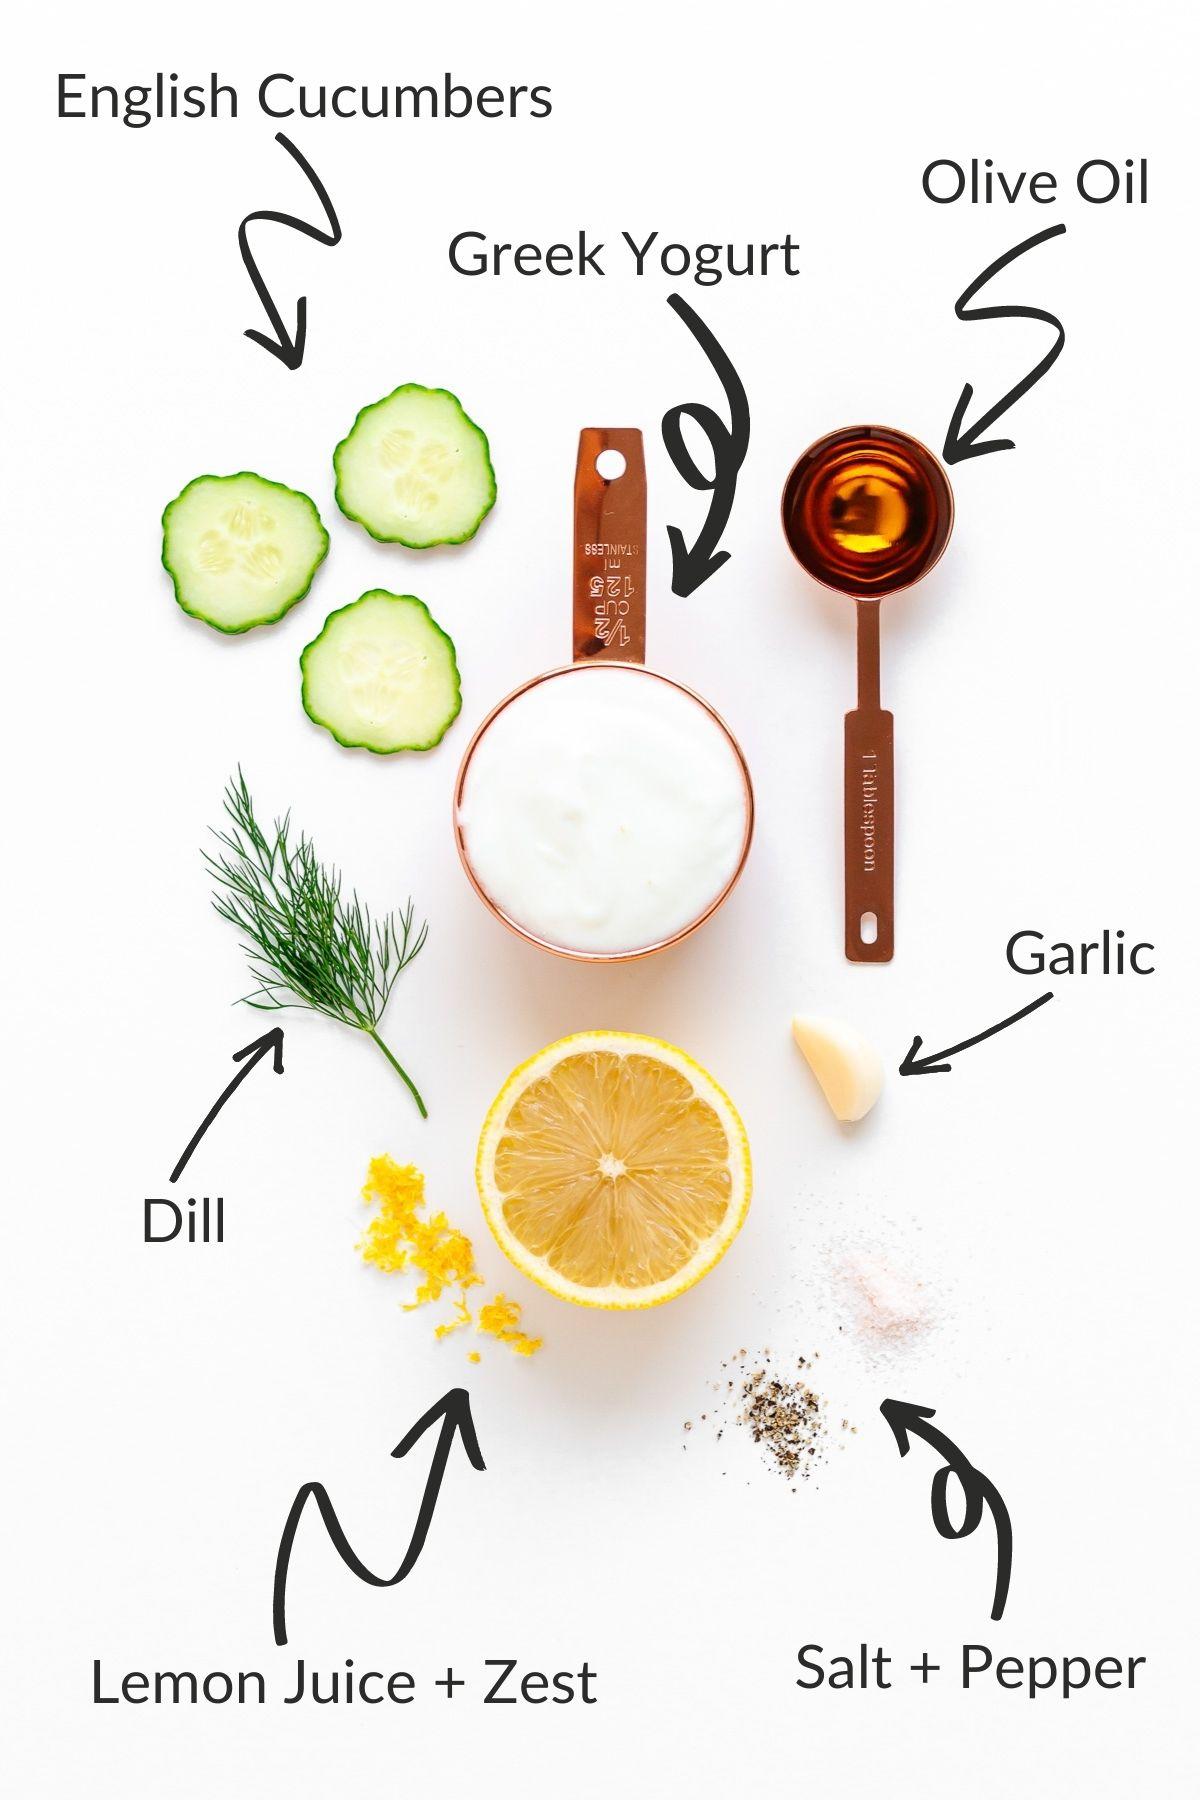 Labelled image showing ingredients needed to make cucumber yogurt salad.